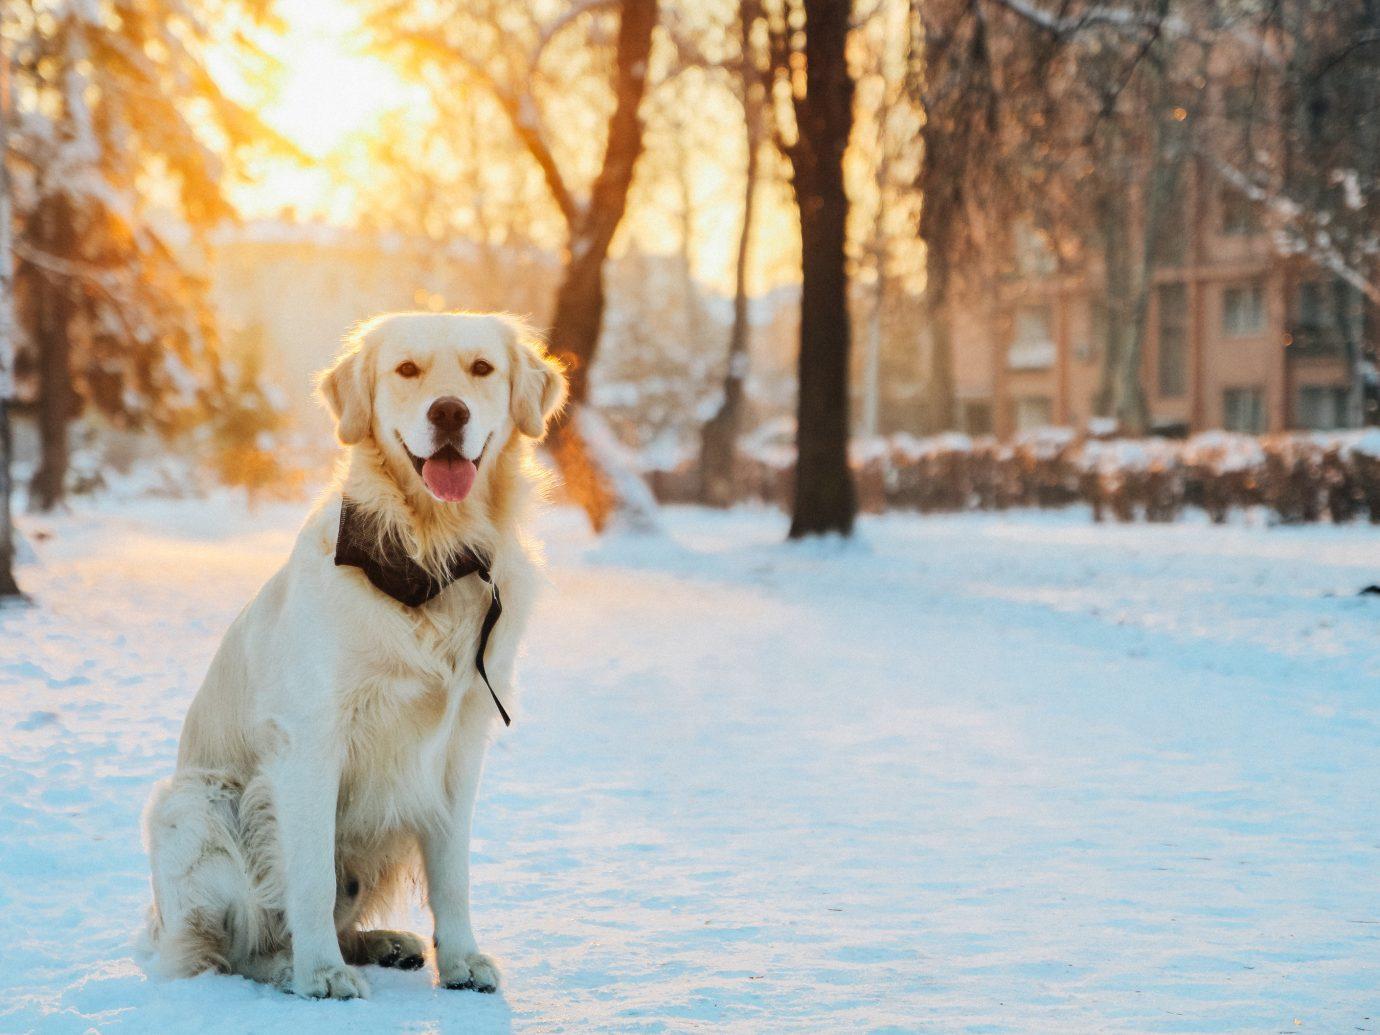 Hotels Dog outdoor tree snow mammal Winter golden retriever weather season dog like mammal retriever